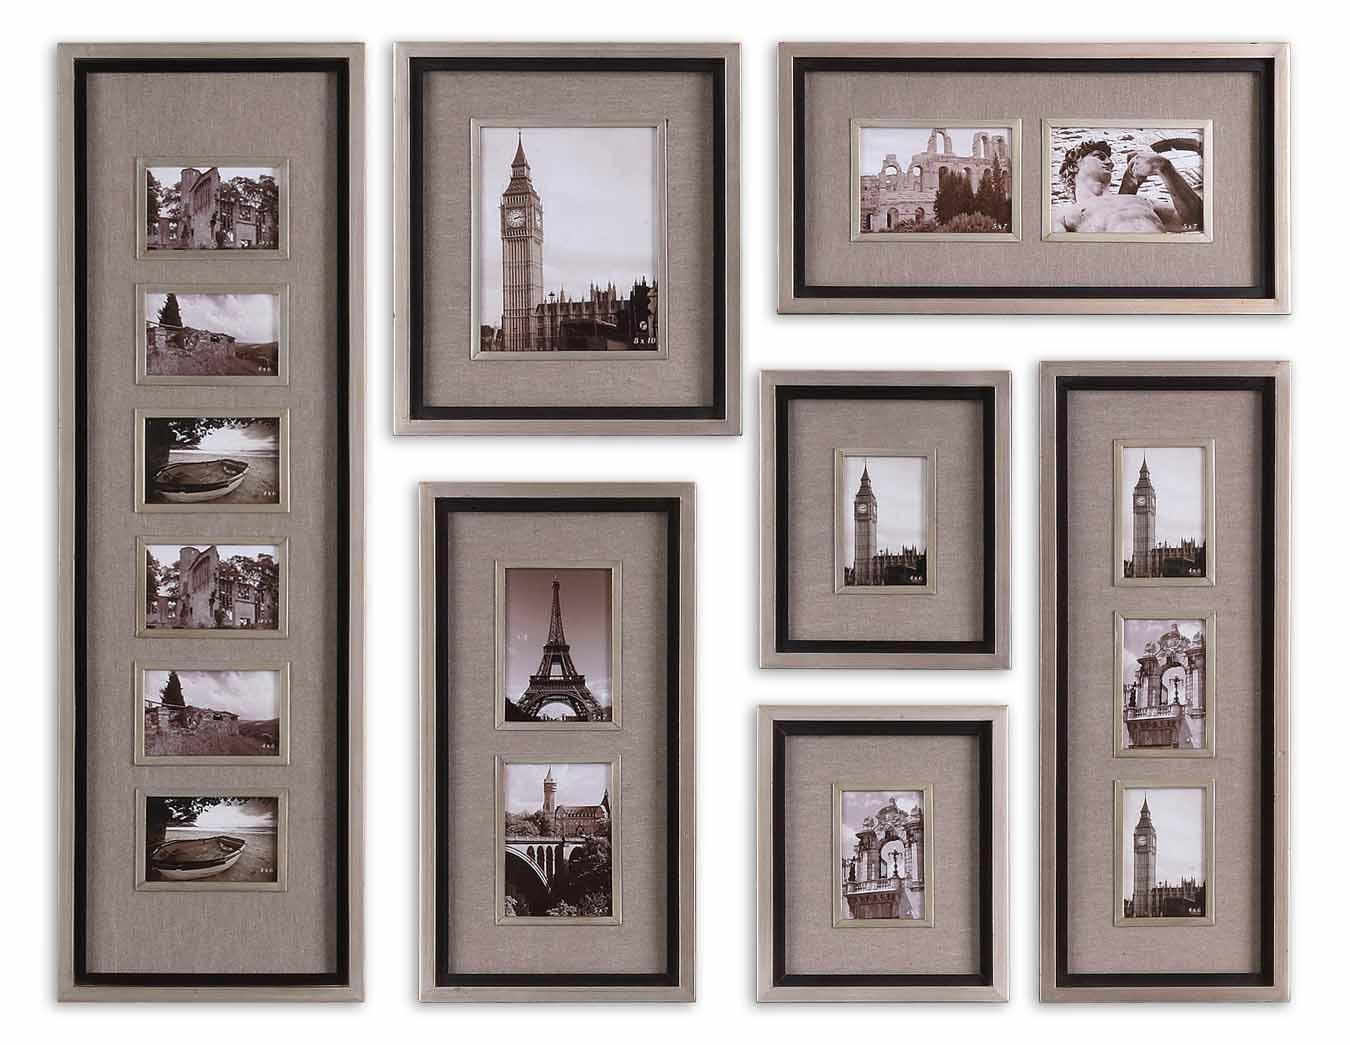 Uttermost Alternative Wall Decor Massena Photo Collage Set of 7 - Item Number: 14458